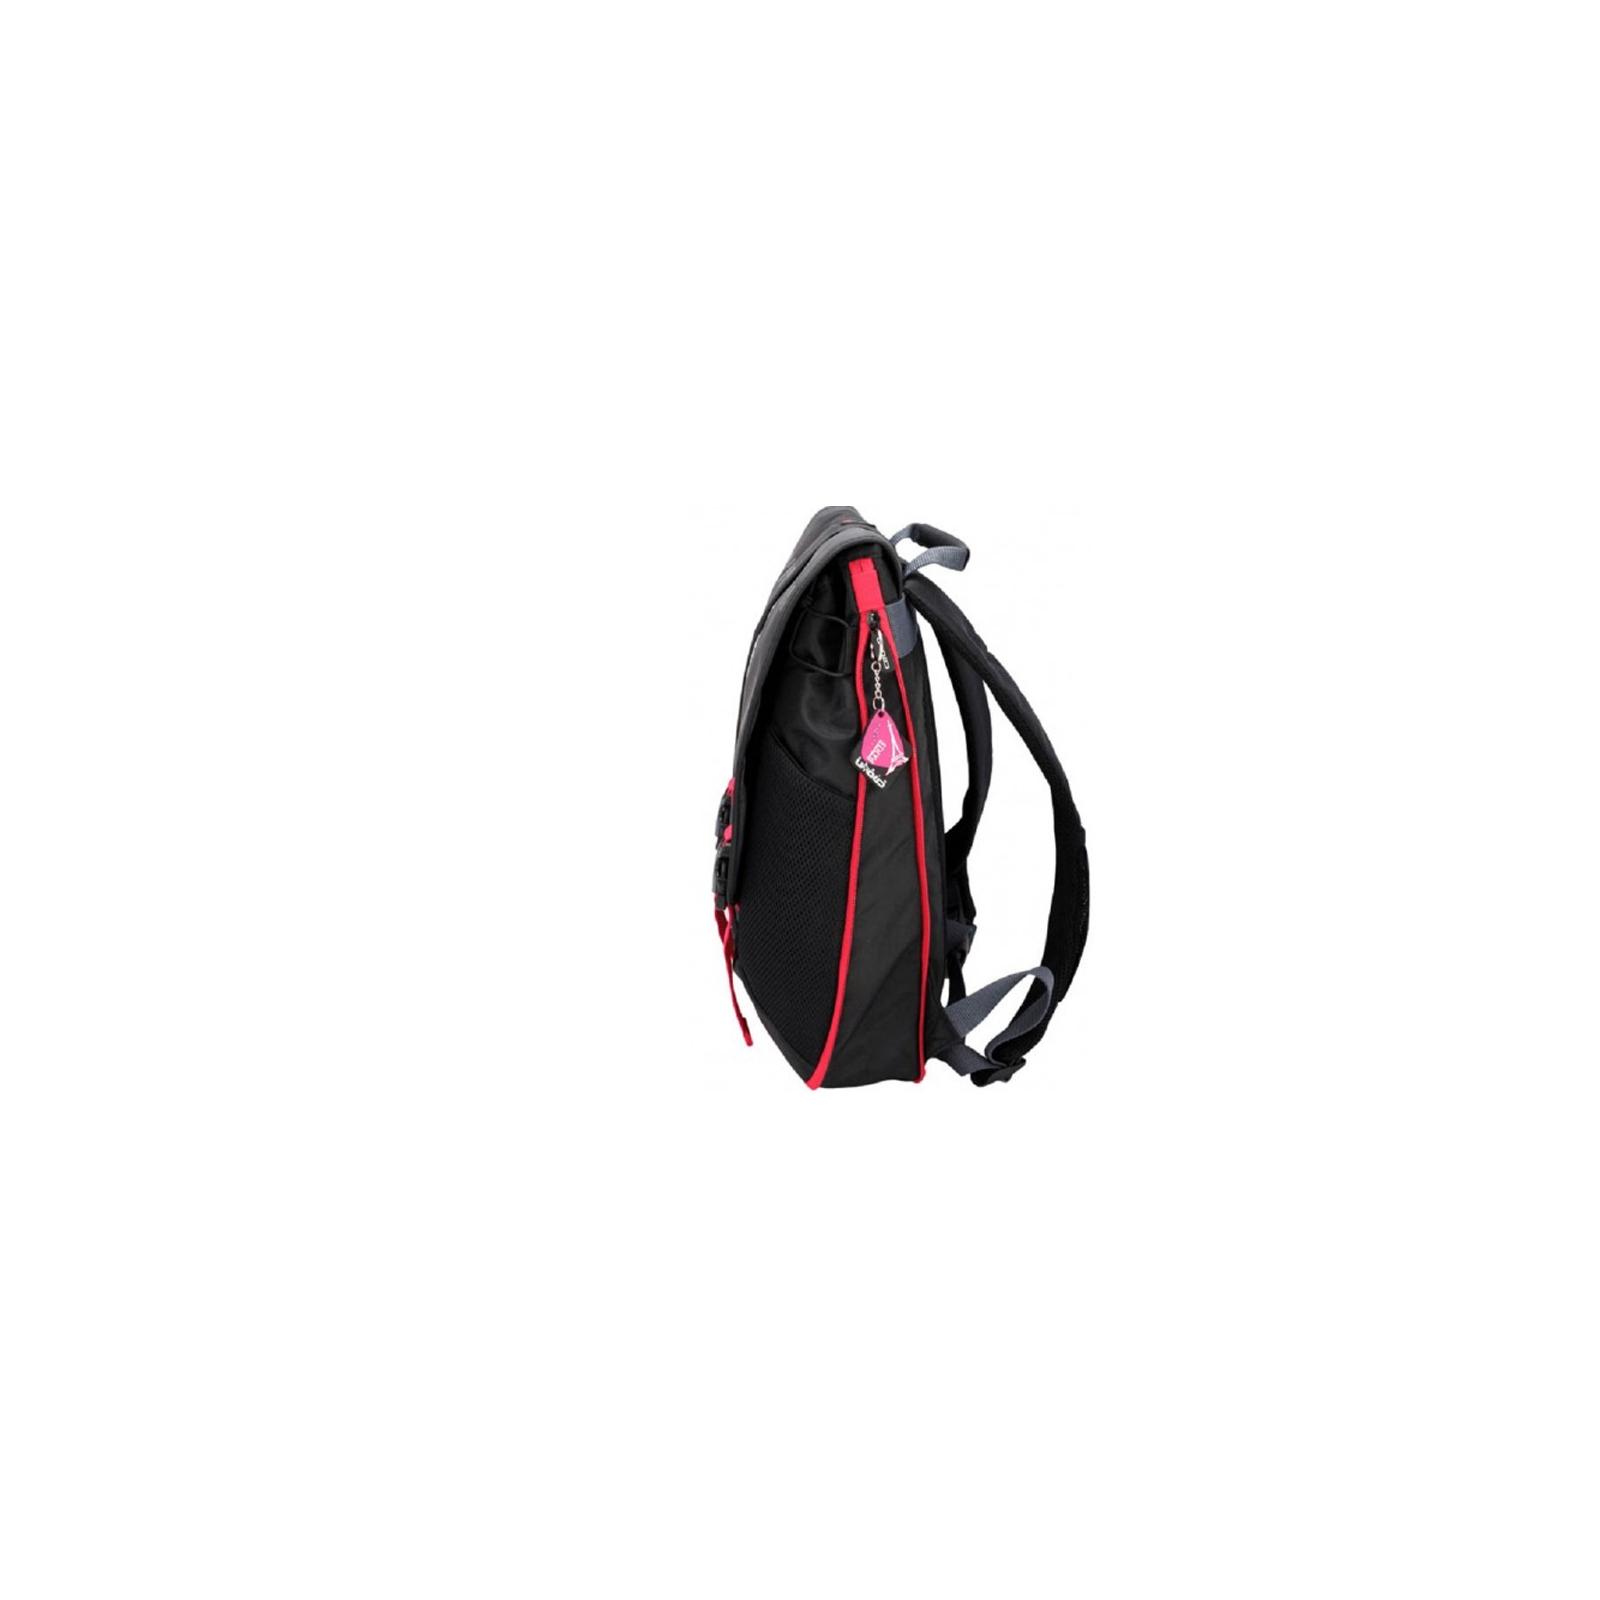 Рюкзак для ноутбука Crown 15.6 Harmony black and red (BPH3315BR) изображение 3